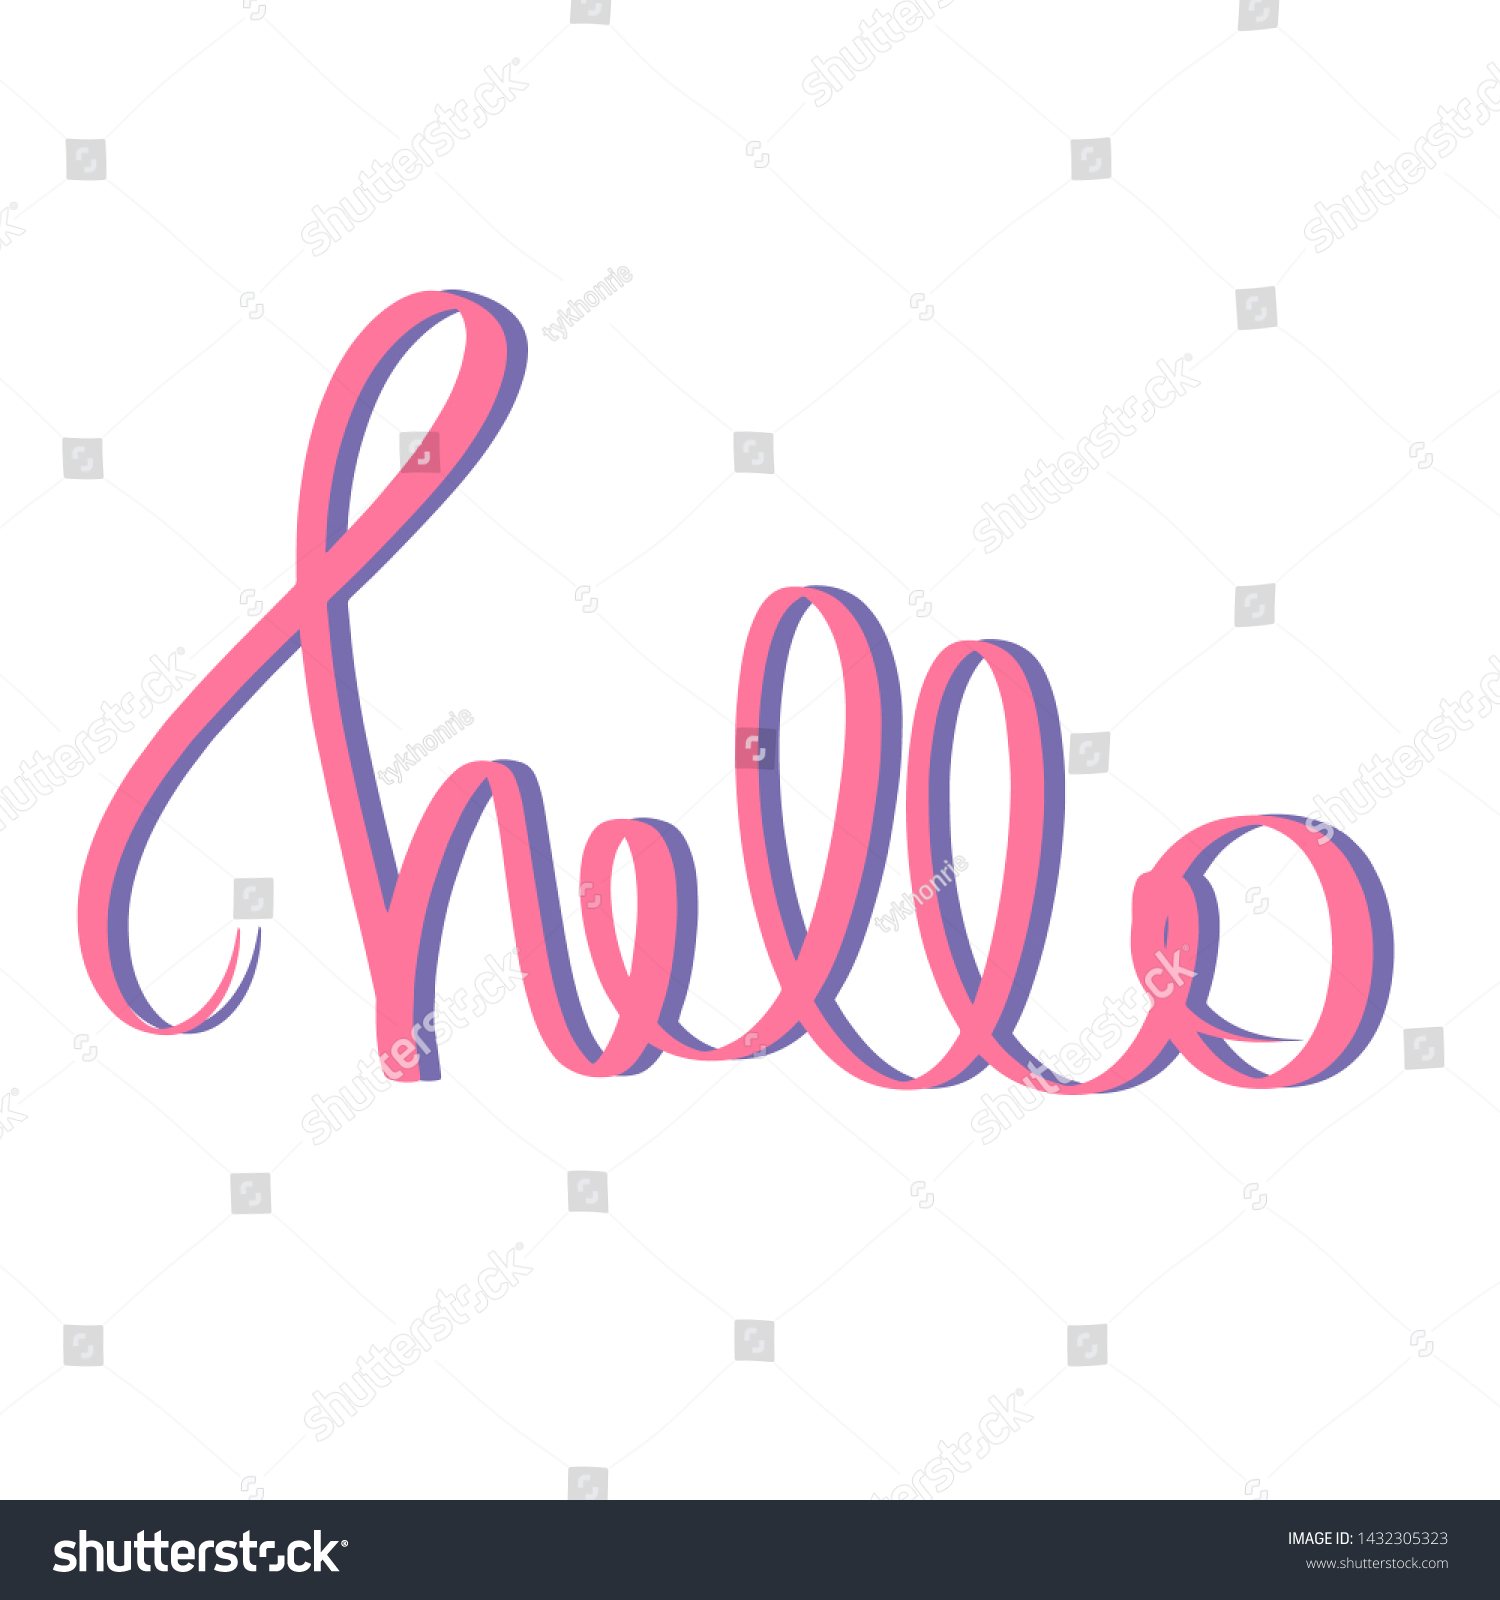 stock-photo-hello-pink-violet-brush-hand